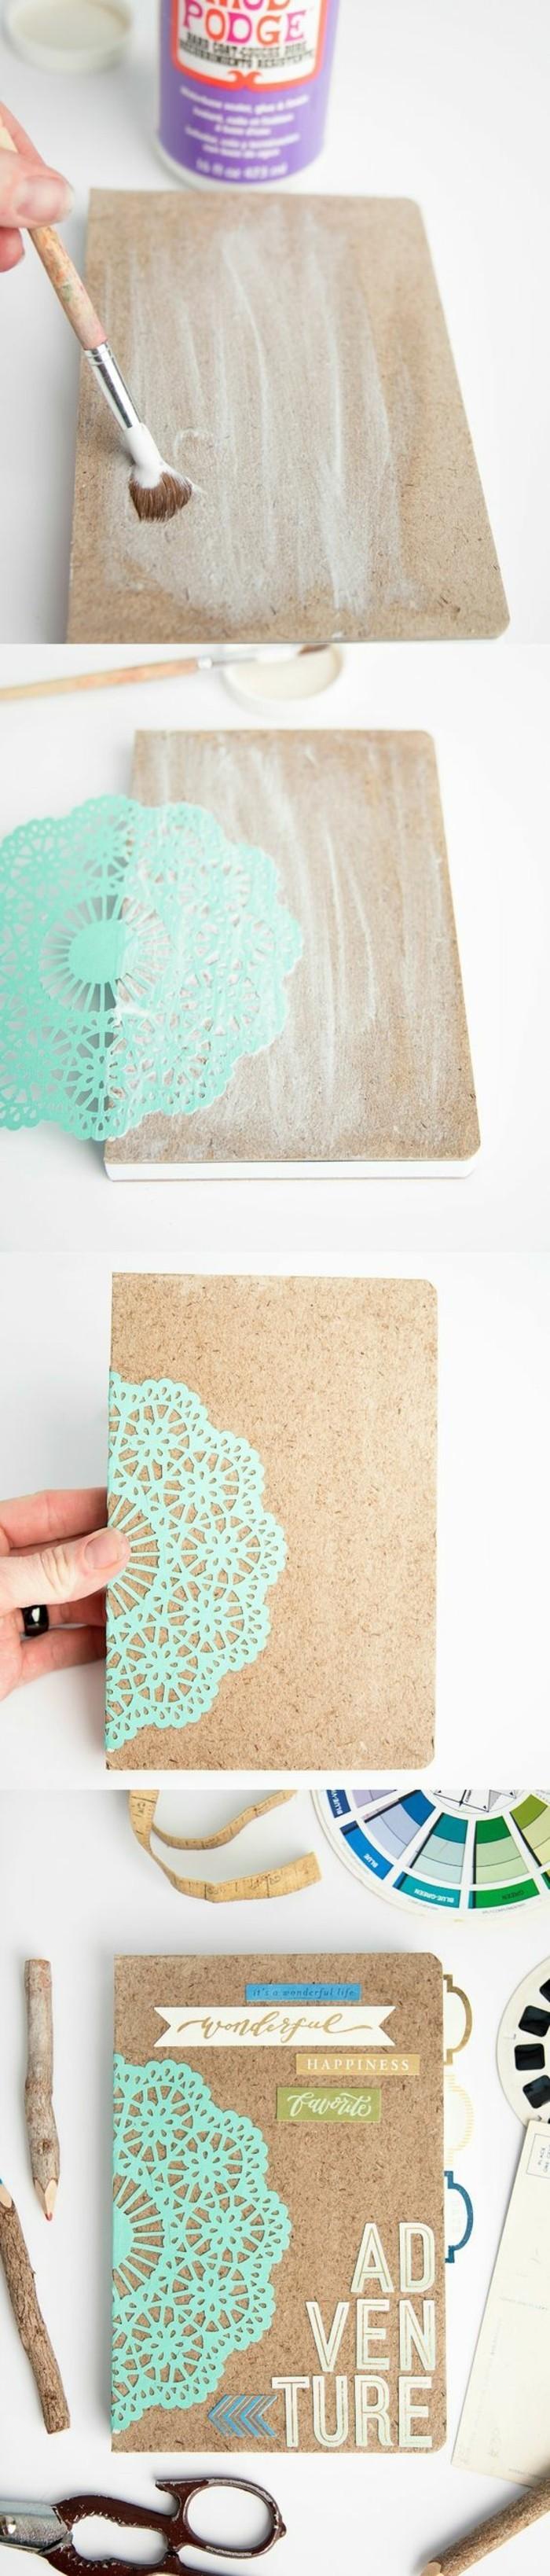 cork board, adventure letters, cute gift ideas for boyfriend, mod podge, green decoration